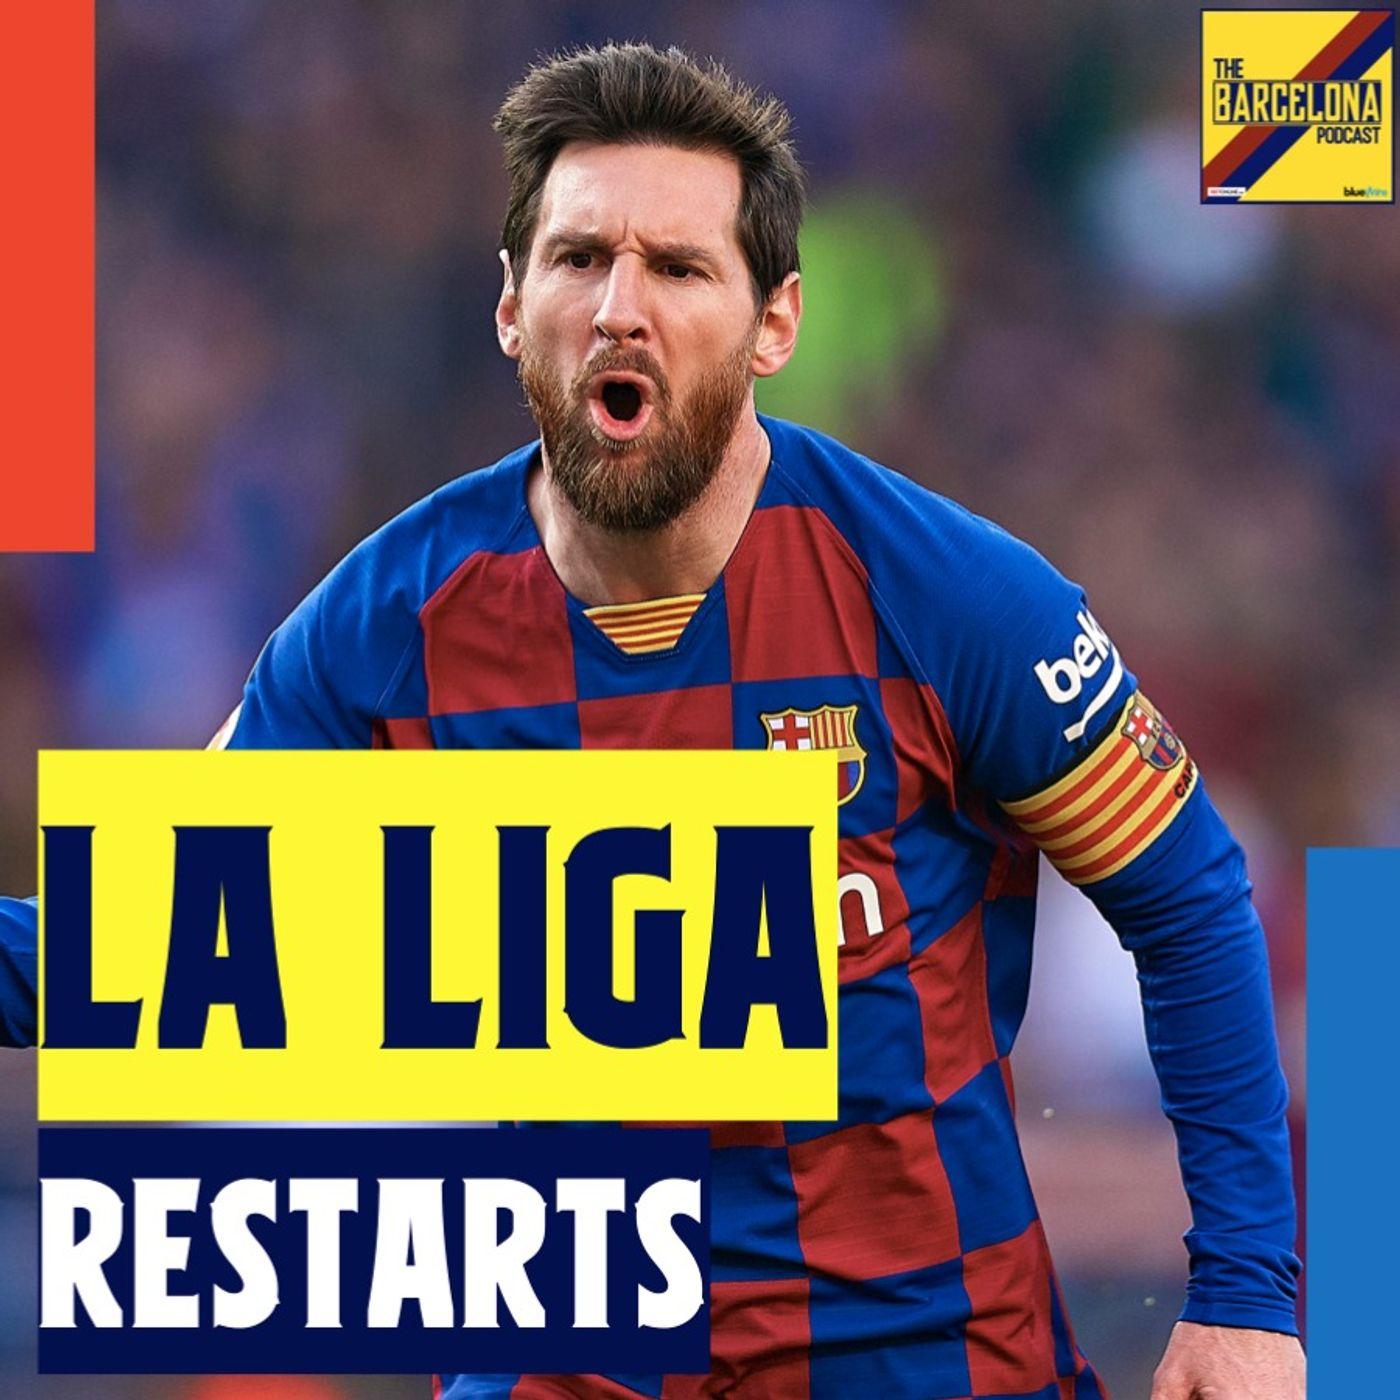 La Liga restart, offloading Coutinho, and Neymar vs. Lautaro - U.S. Penyes Special